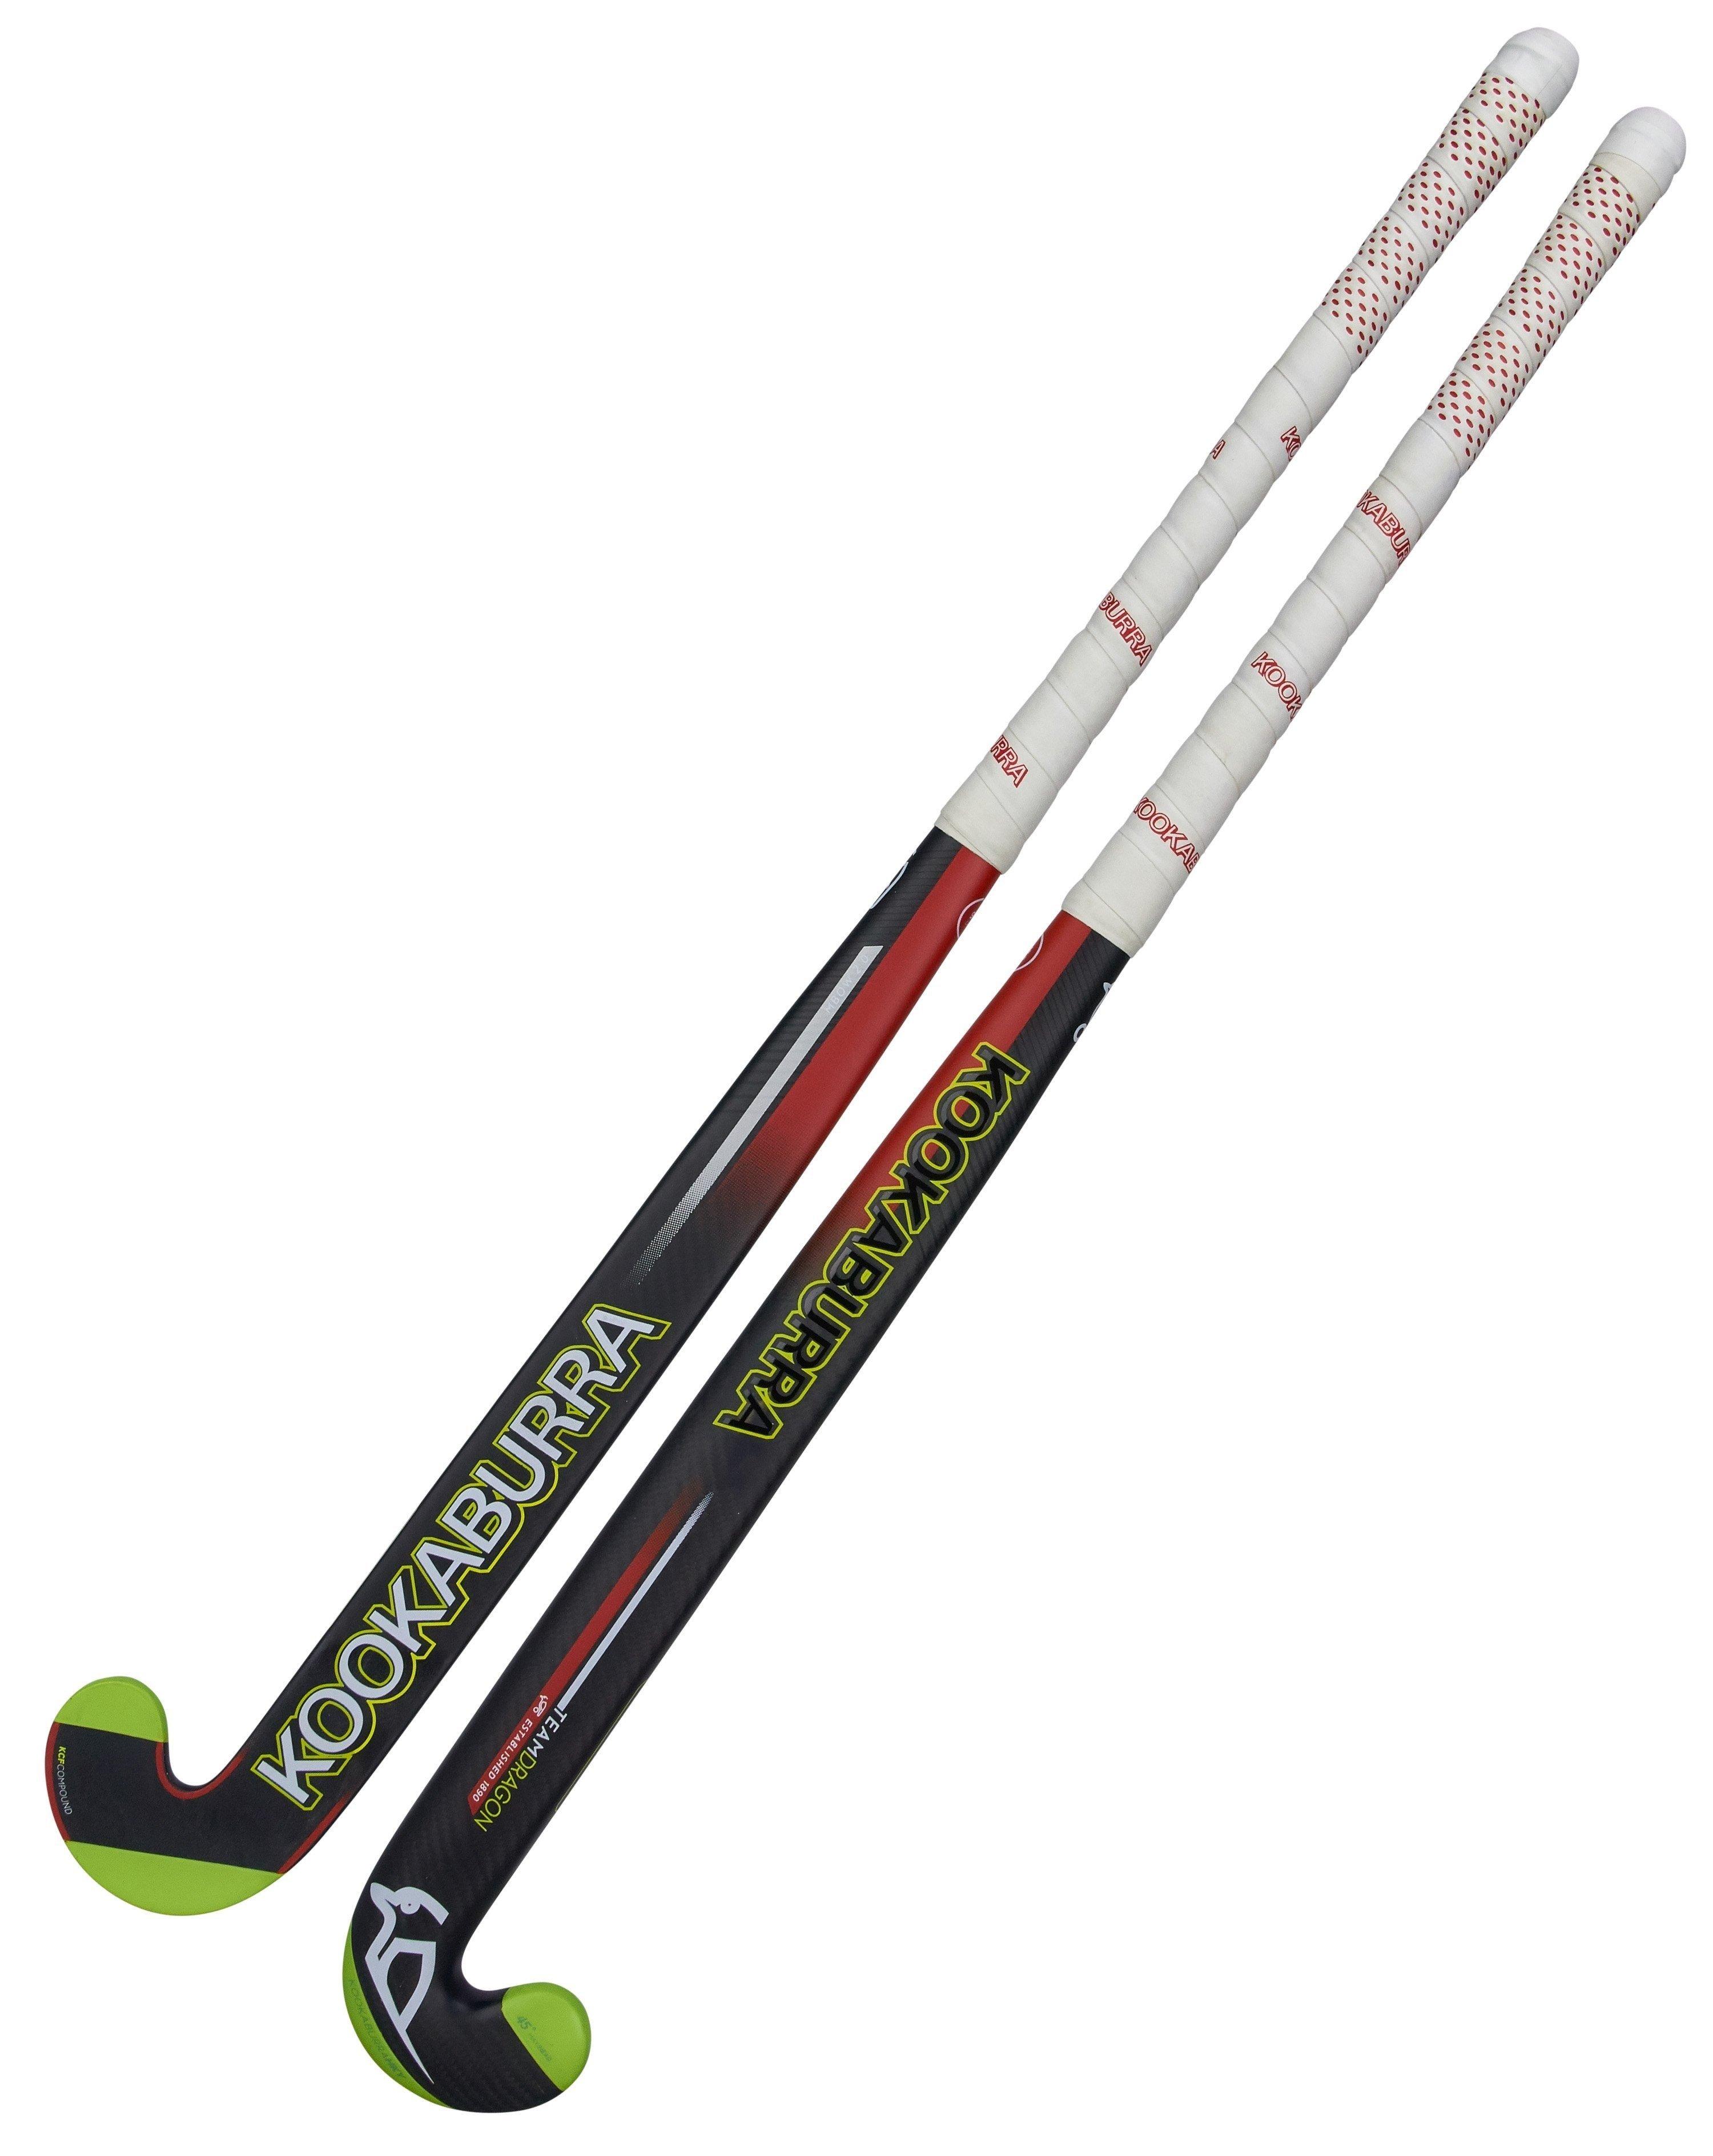 2017/18 Kookaburra Team Dragon - Mbow 2.0 Hockey Stick